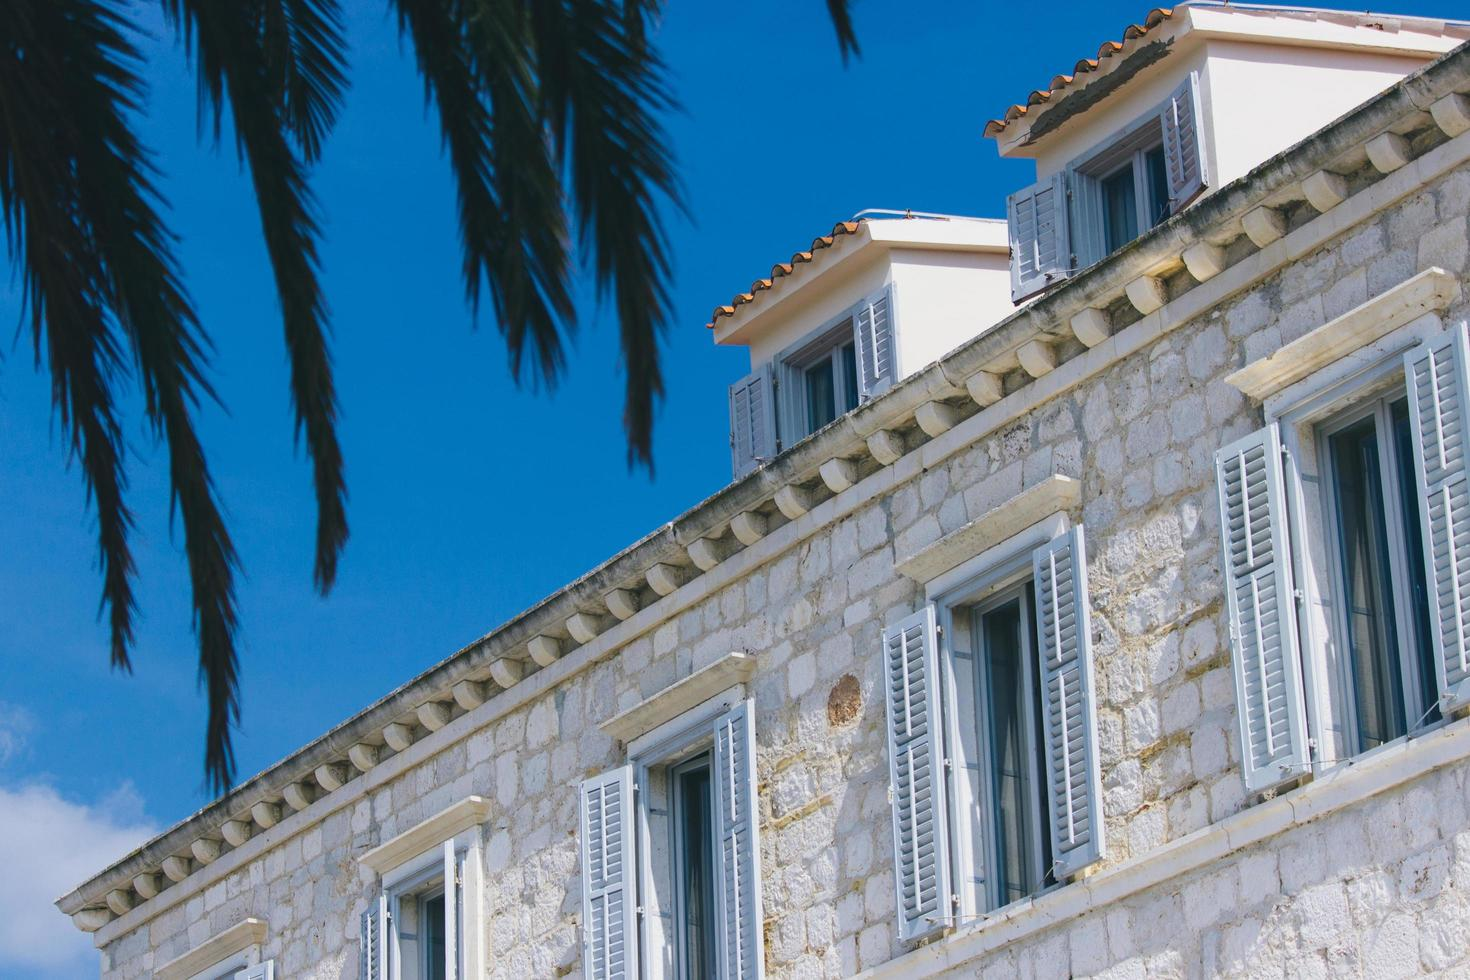 Casa de piedra blanca mostrando persianas de ventana foto